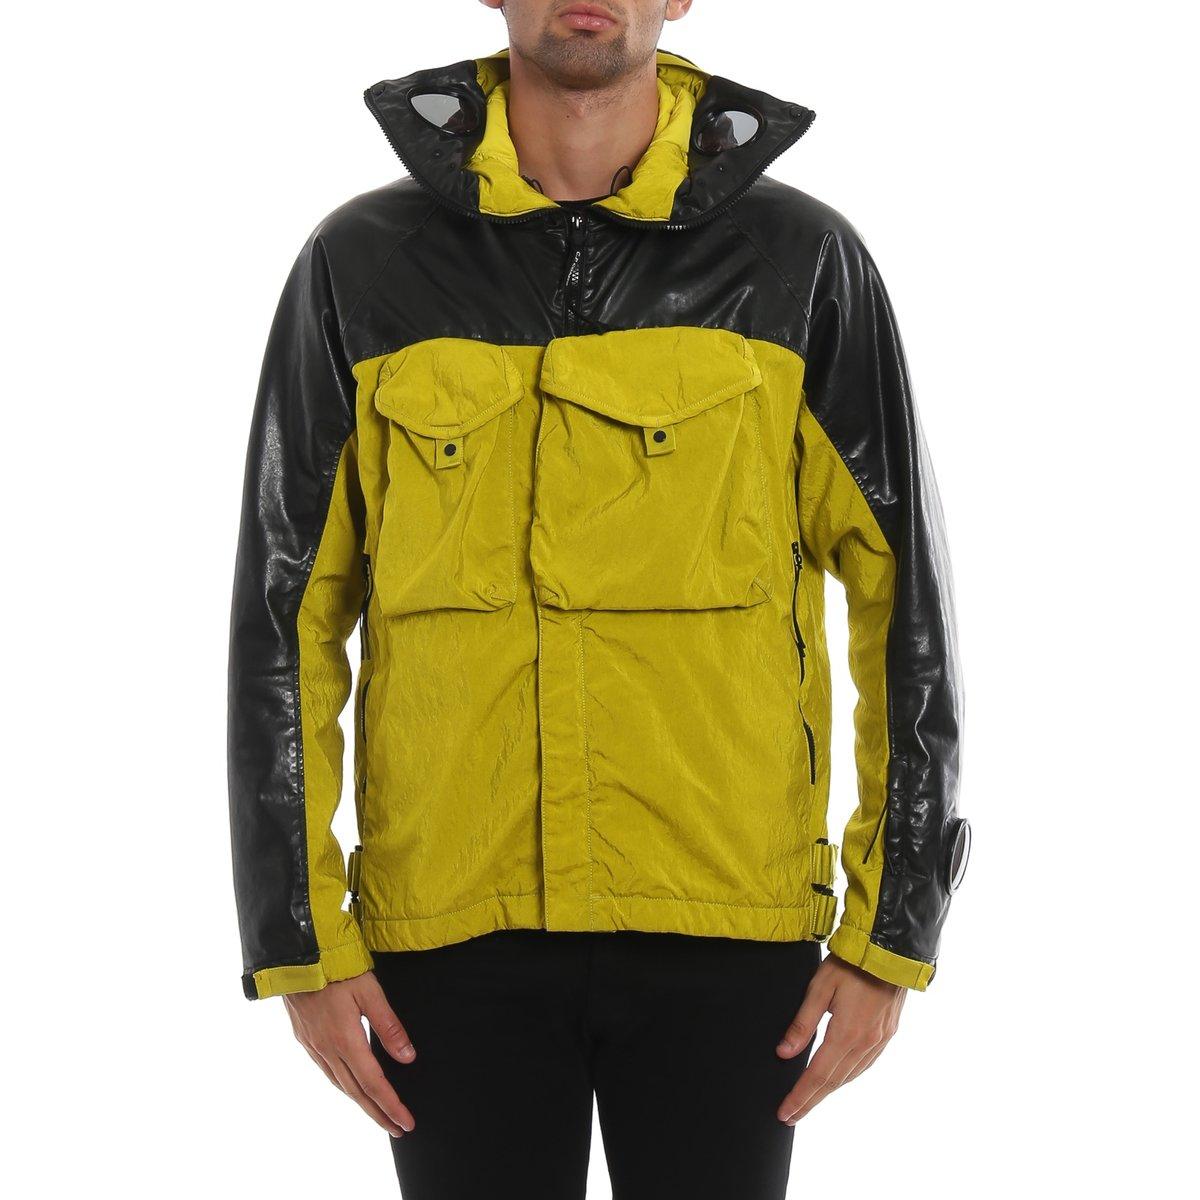 iKRIX-c.p.-company-padded-jackets-la-mille-quartz-goggle-padded-jacket-00000171748f00s003.jpg